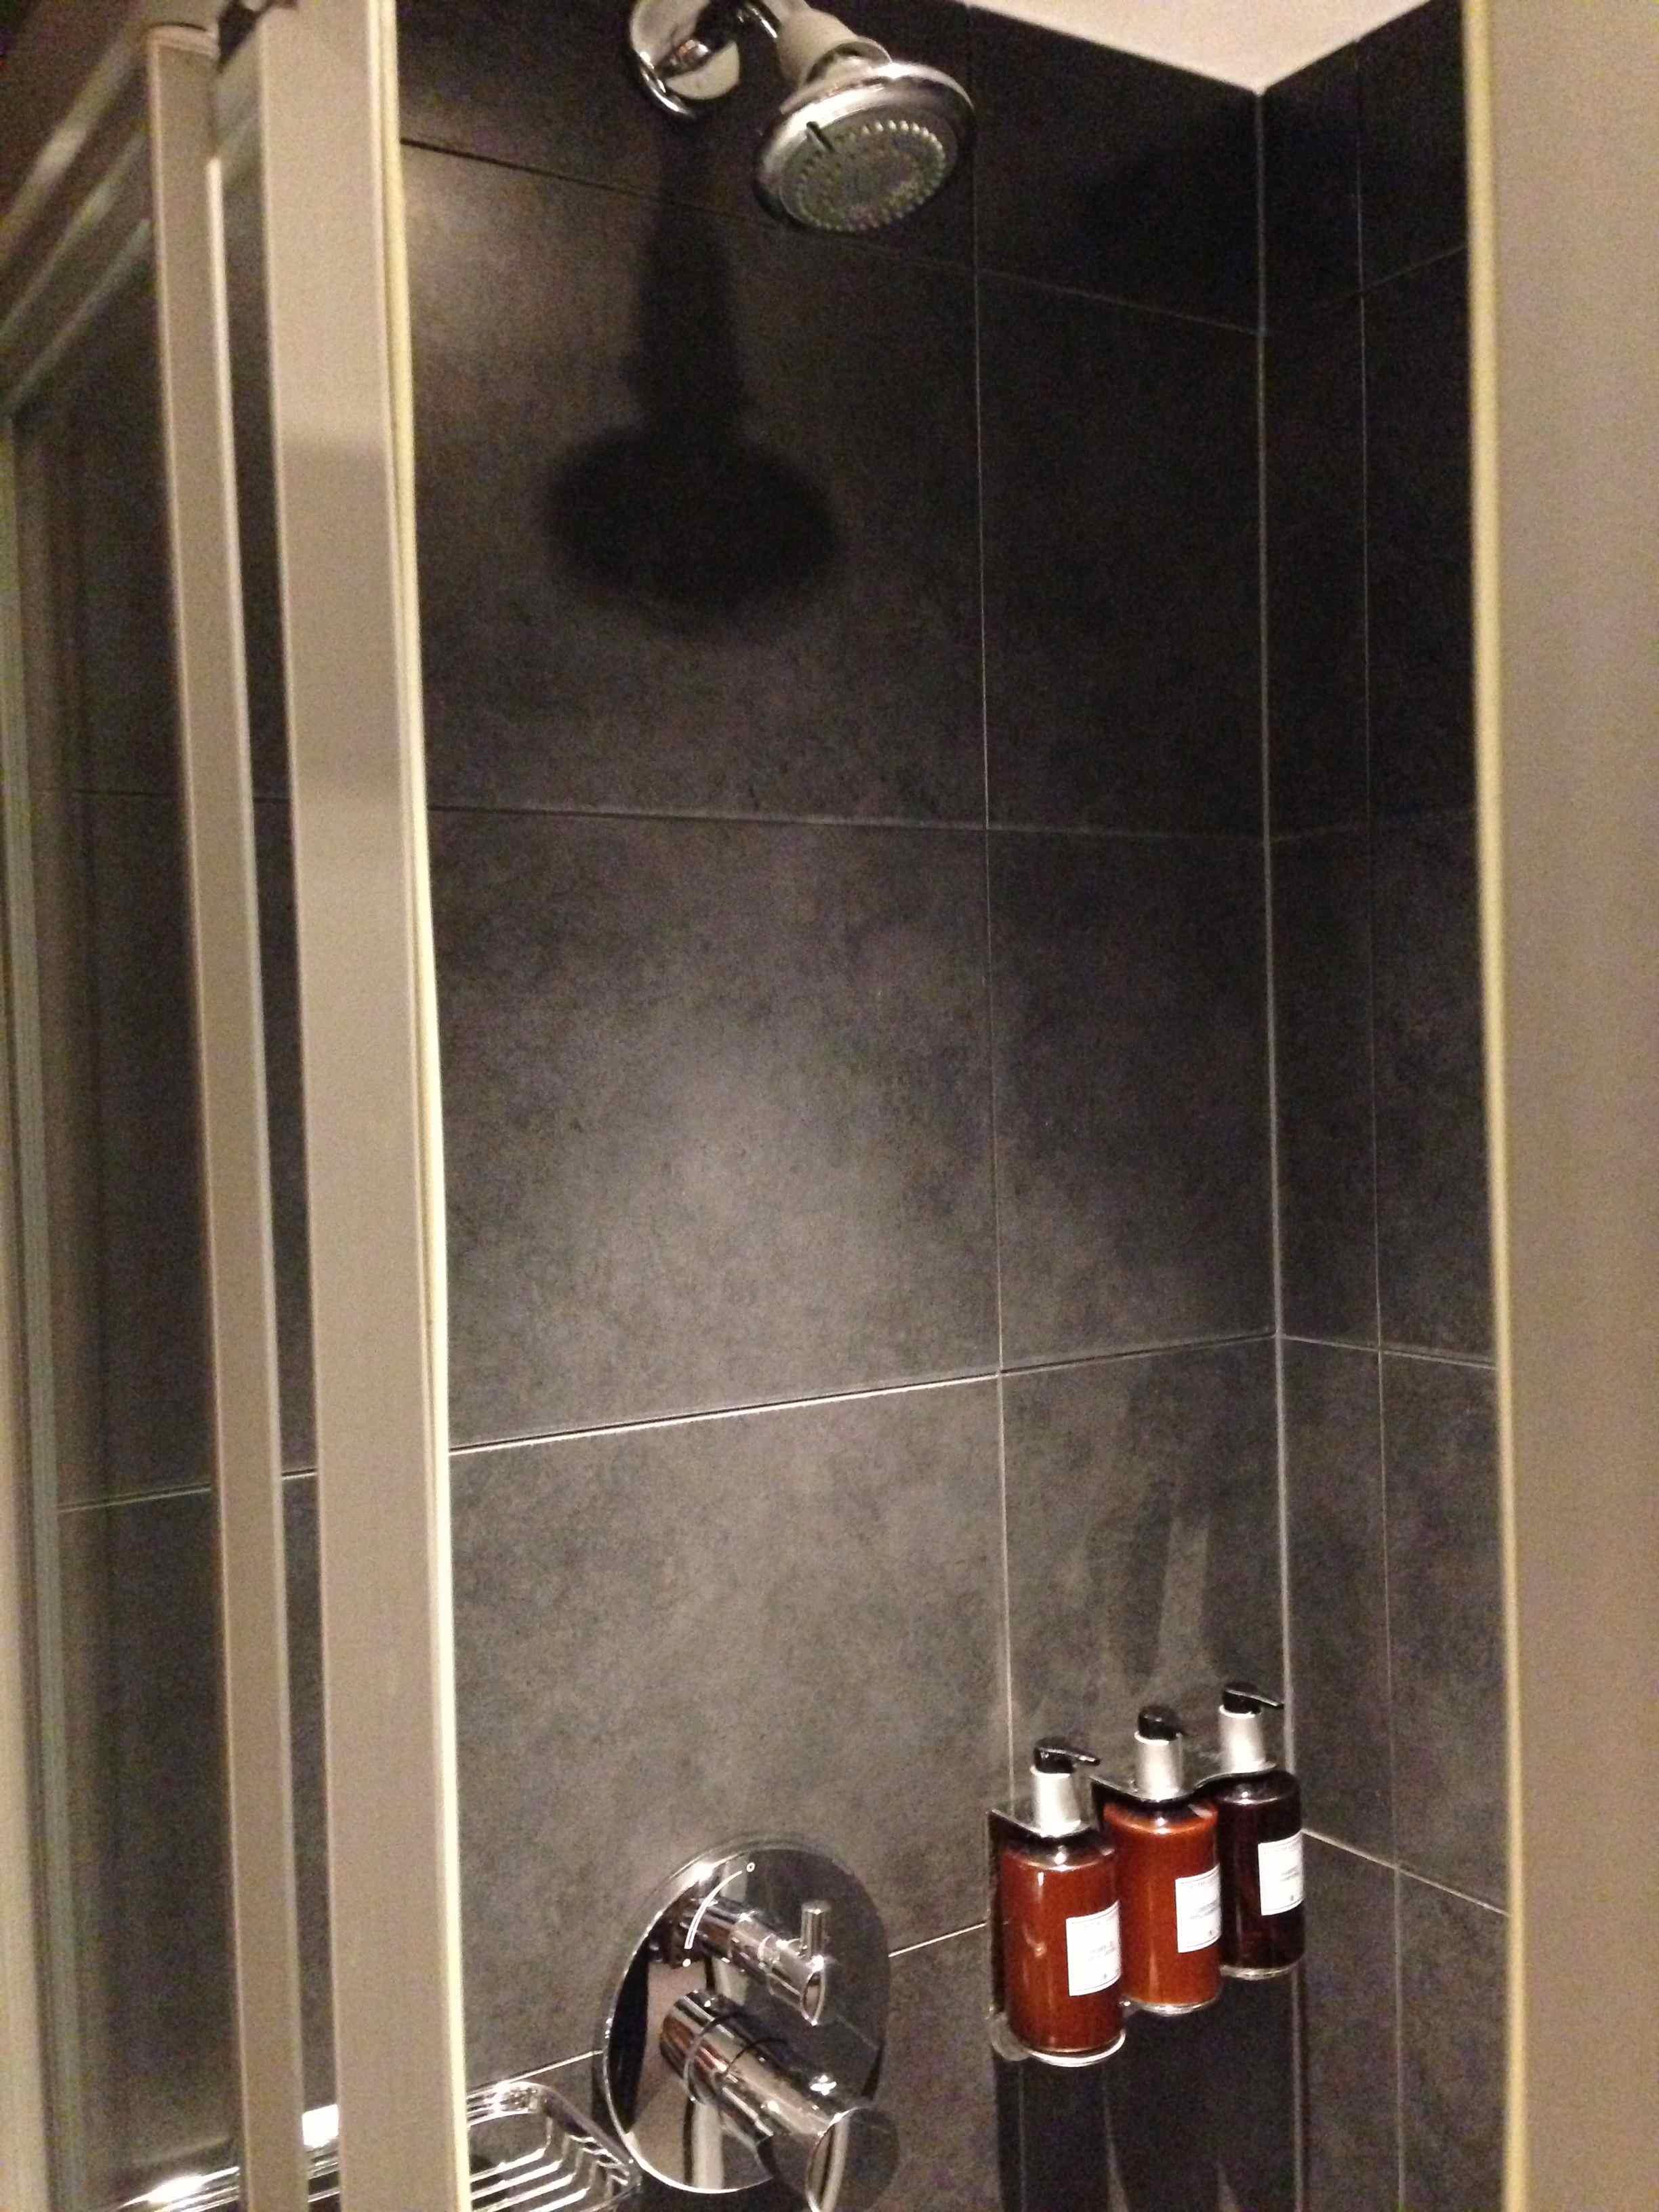 Bathroom Mirrors Guildford trip report - radisson blu edwardian - guildford, surrey - uk